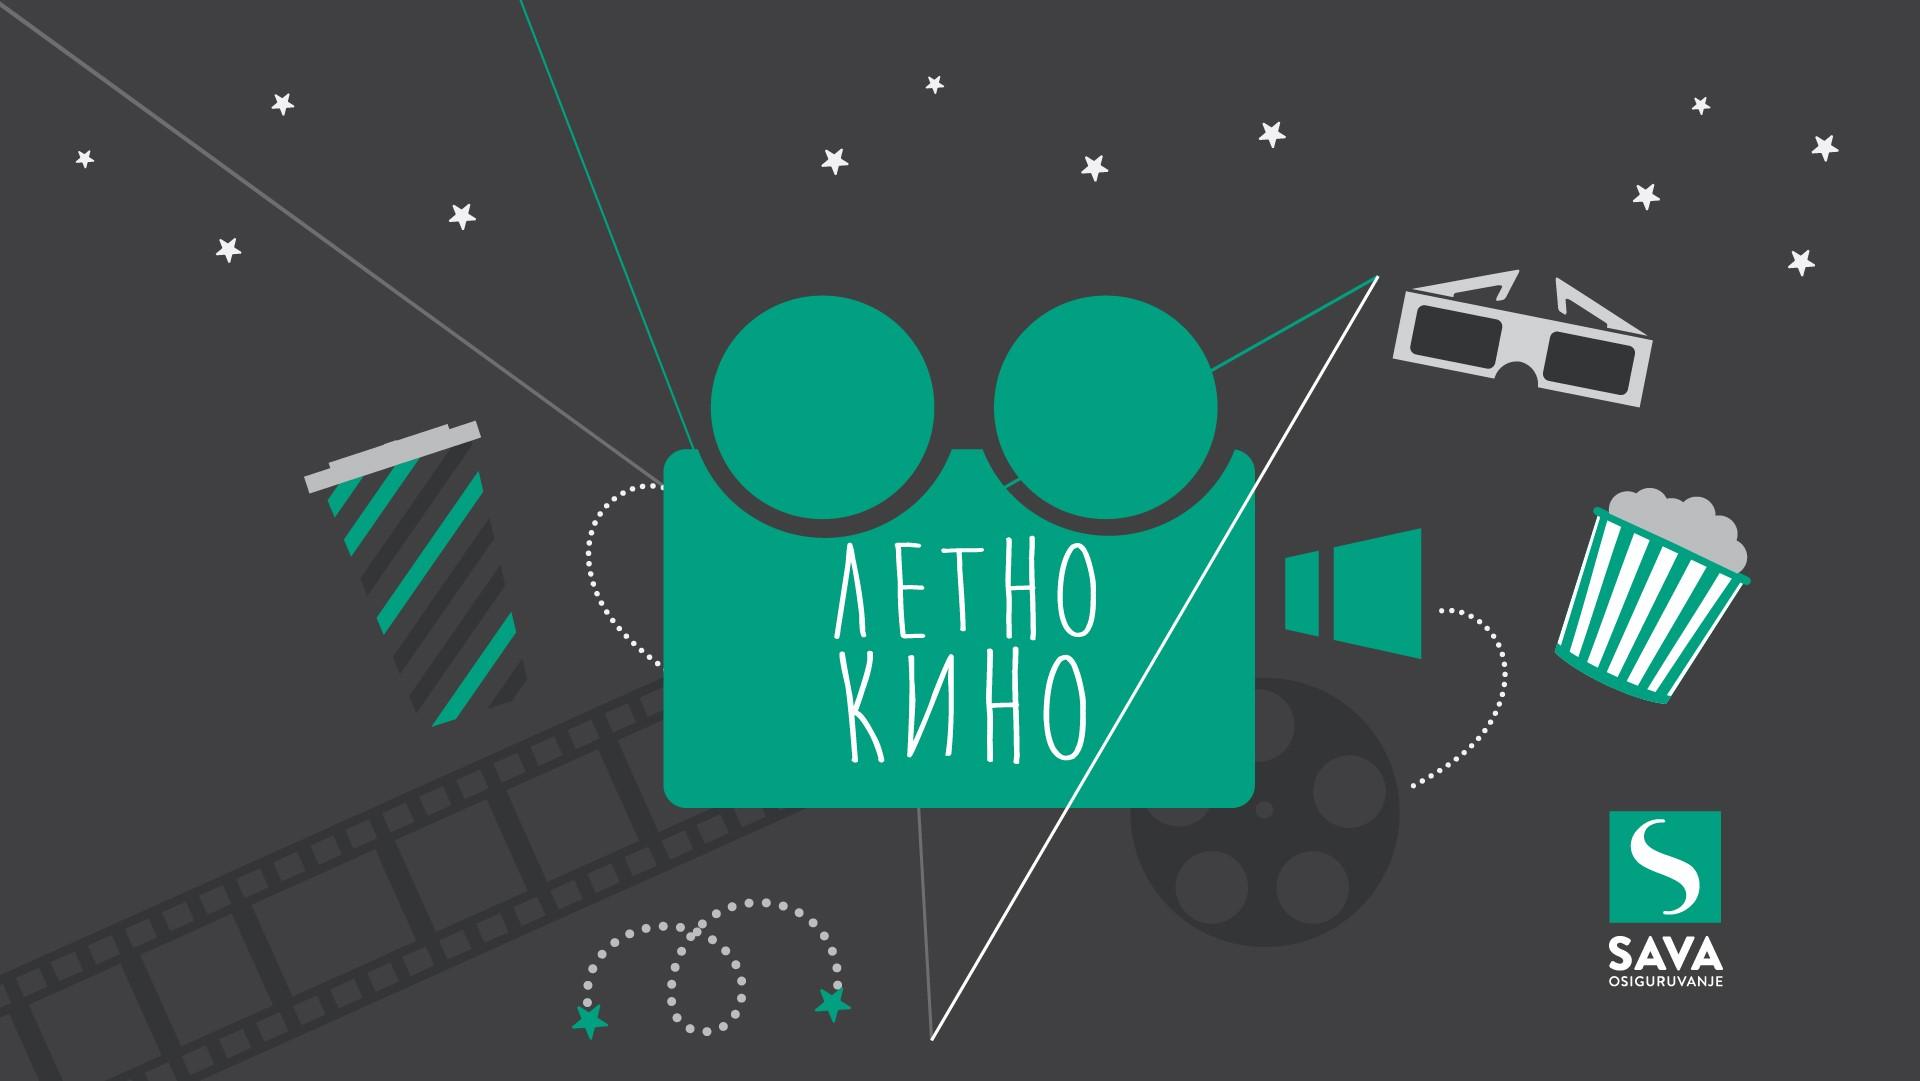 filmovi-pod-vedro-nebo-sekoja-sabota-vo-gradskiot-park